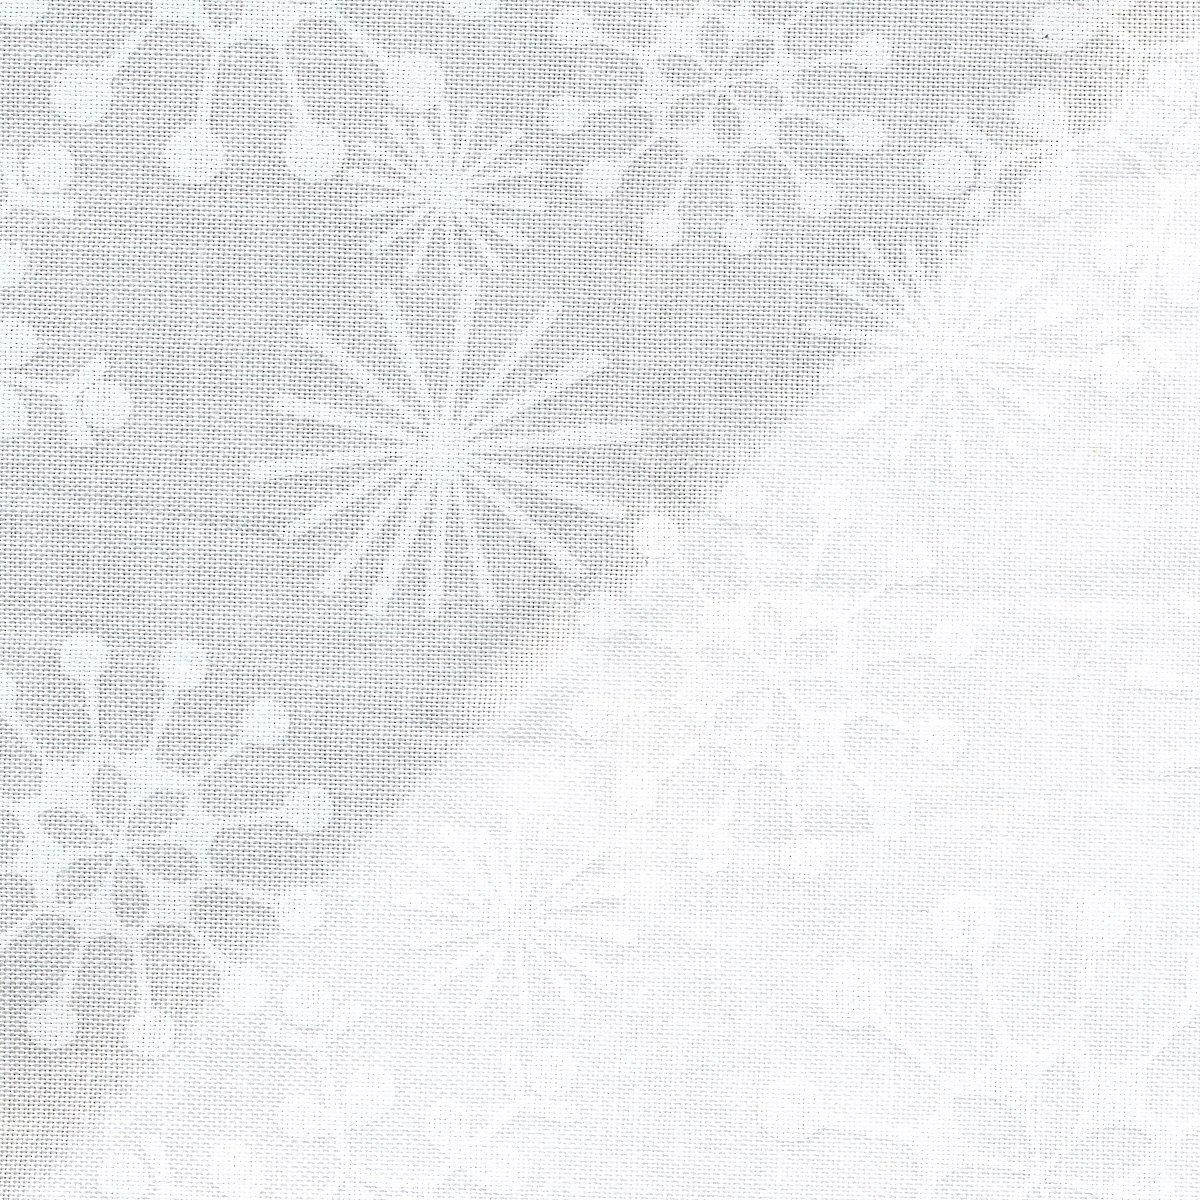 Solitaire Whites - MAS7844-UW